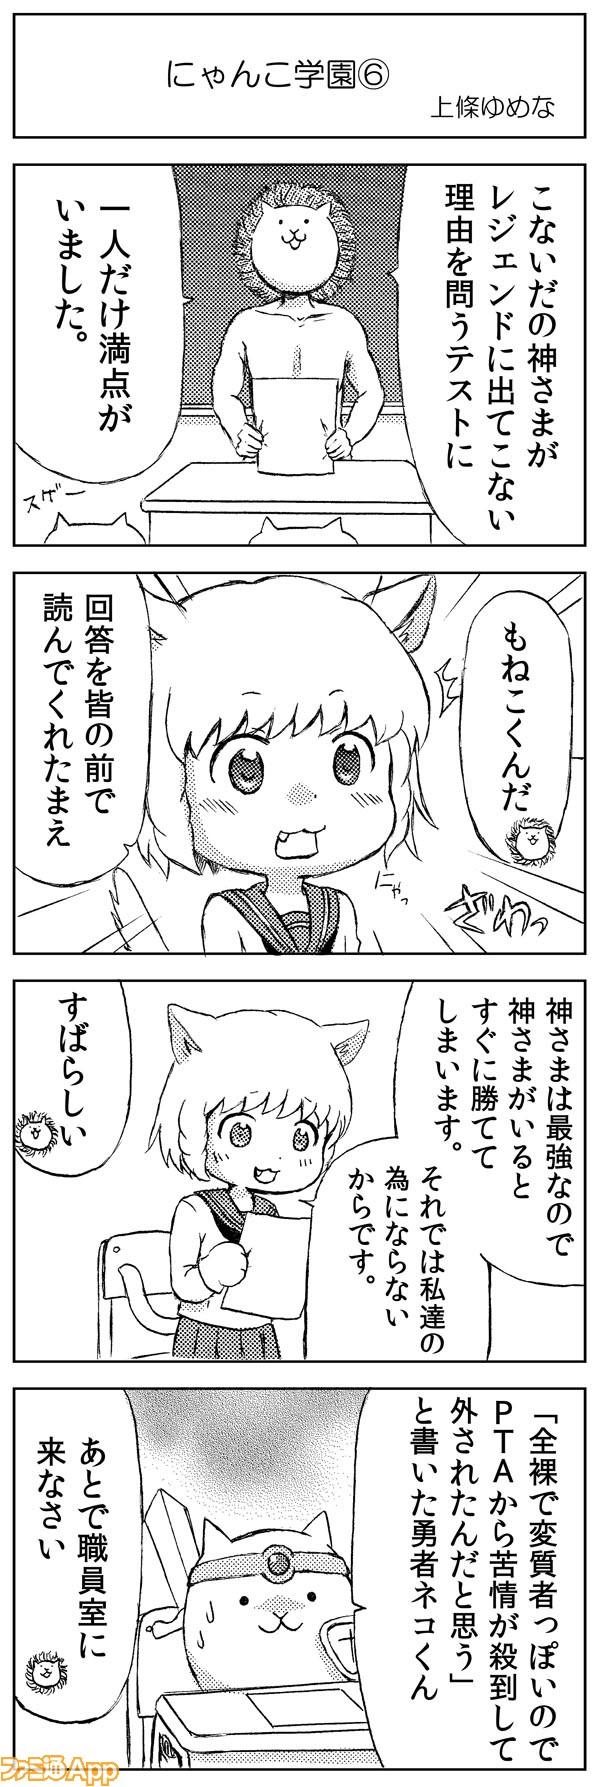 03kami_060